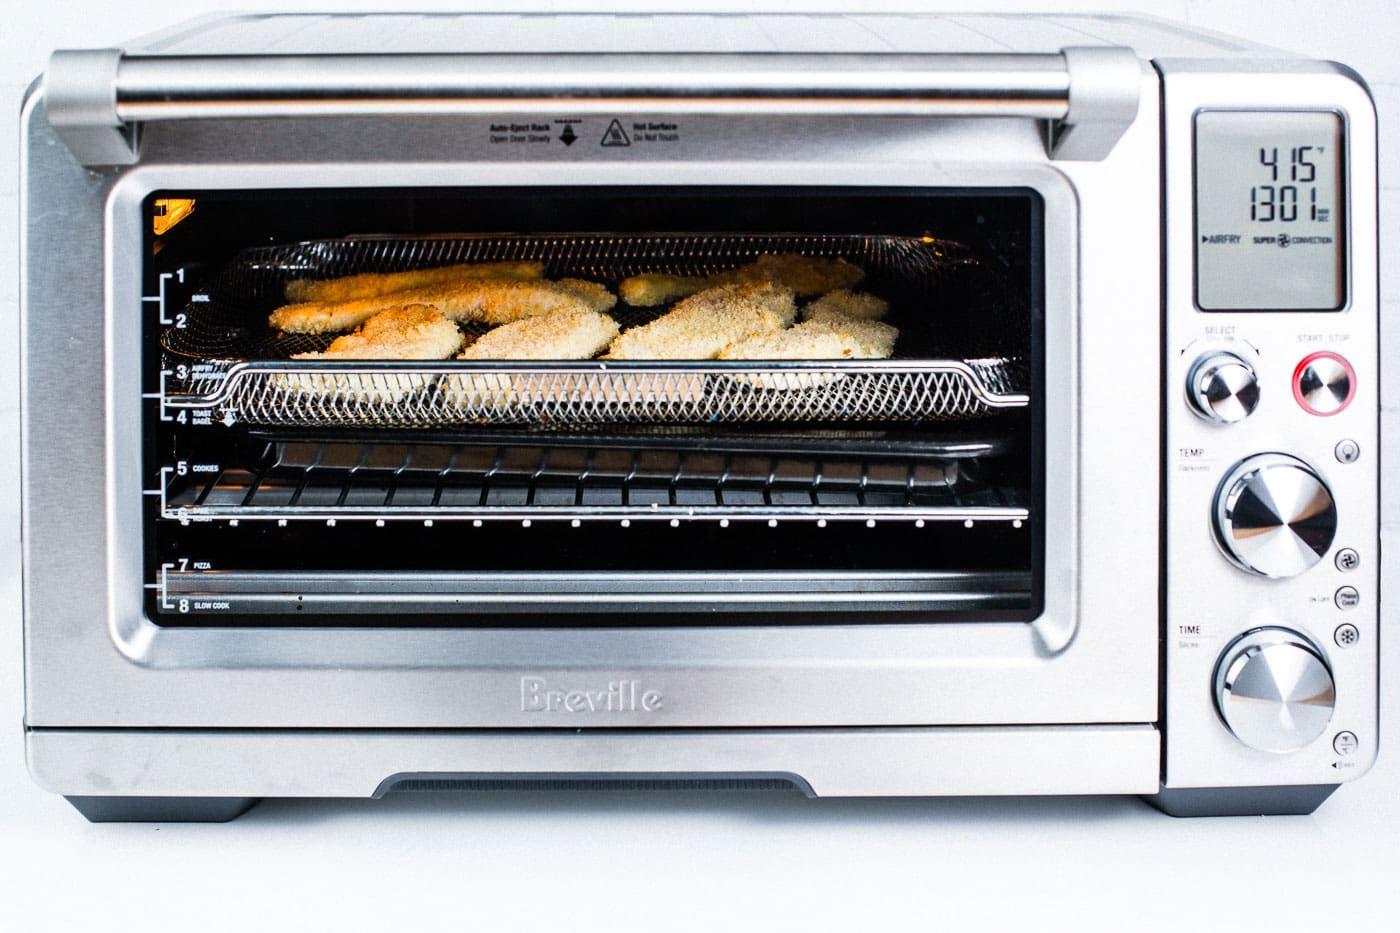 Crispy Air Fryer Chicken Tenders Recipe Recipe Nuwave Oven Recipes Air Recipe Toaster Oven Recipes